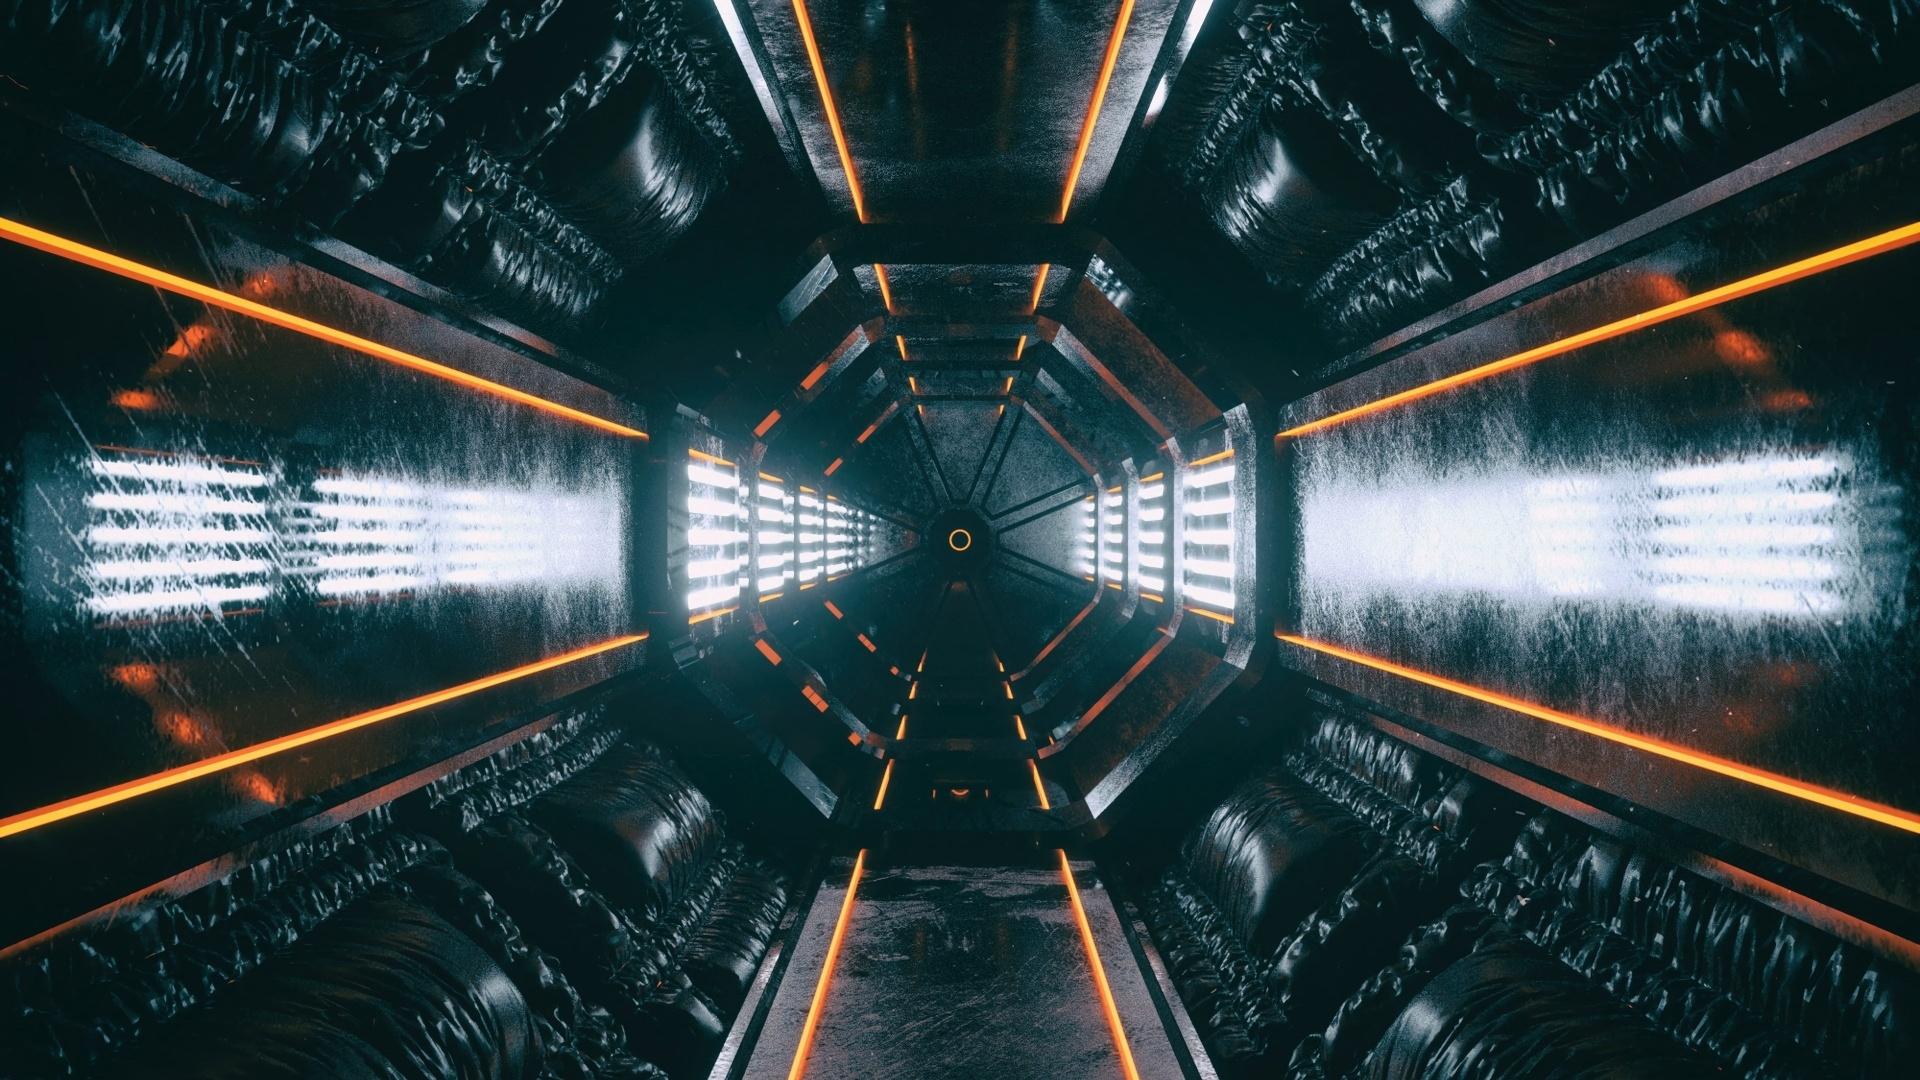 Space Tunnel wallpaper for desktop